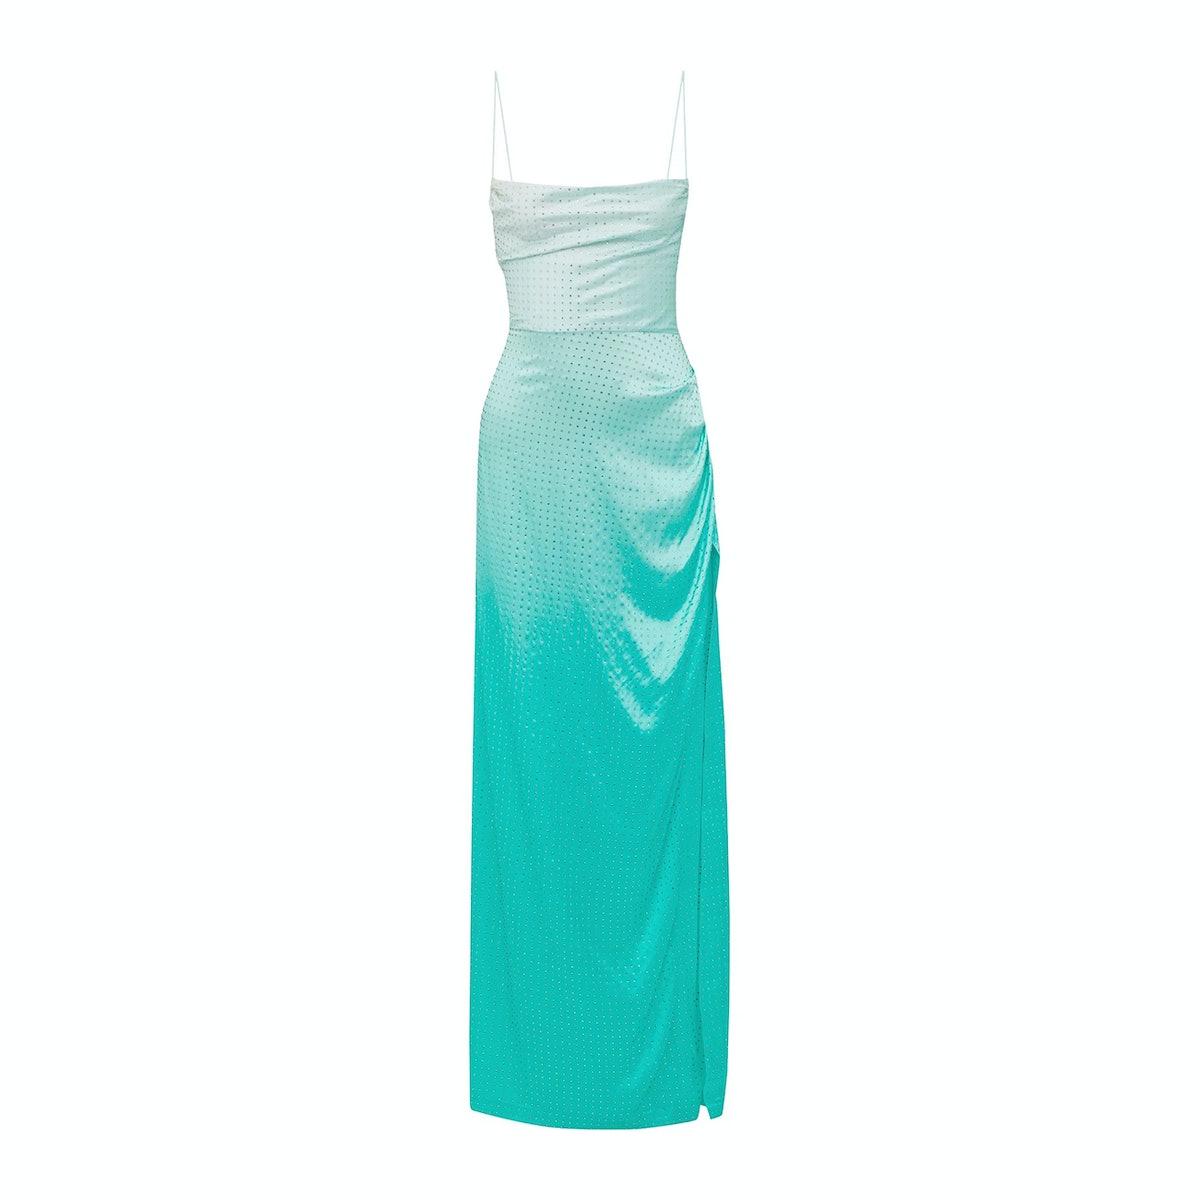 Retrofête Marlene Crystal-Embellished Dégradé Silk-Blend Satin Maxi Dress